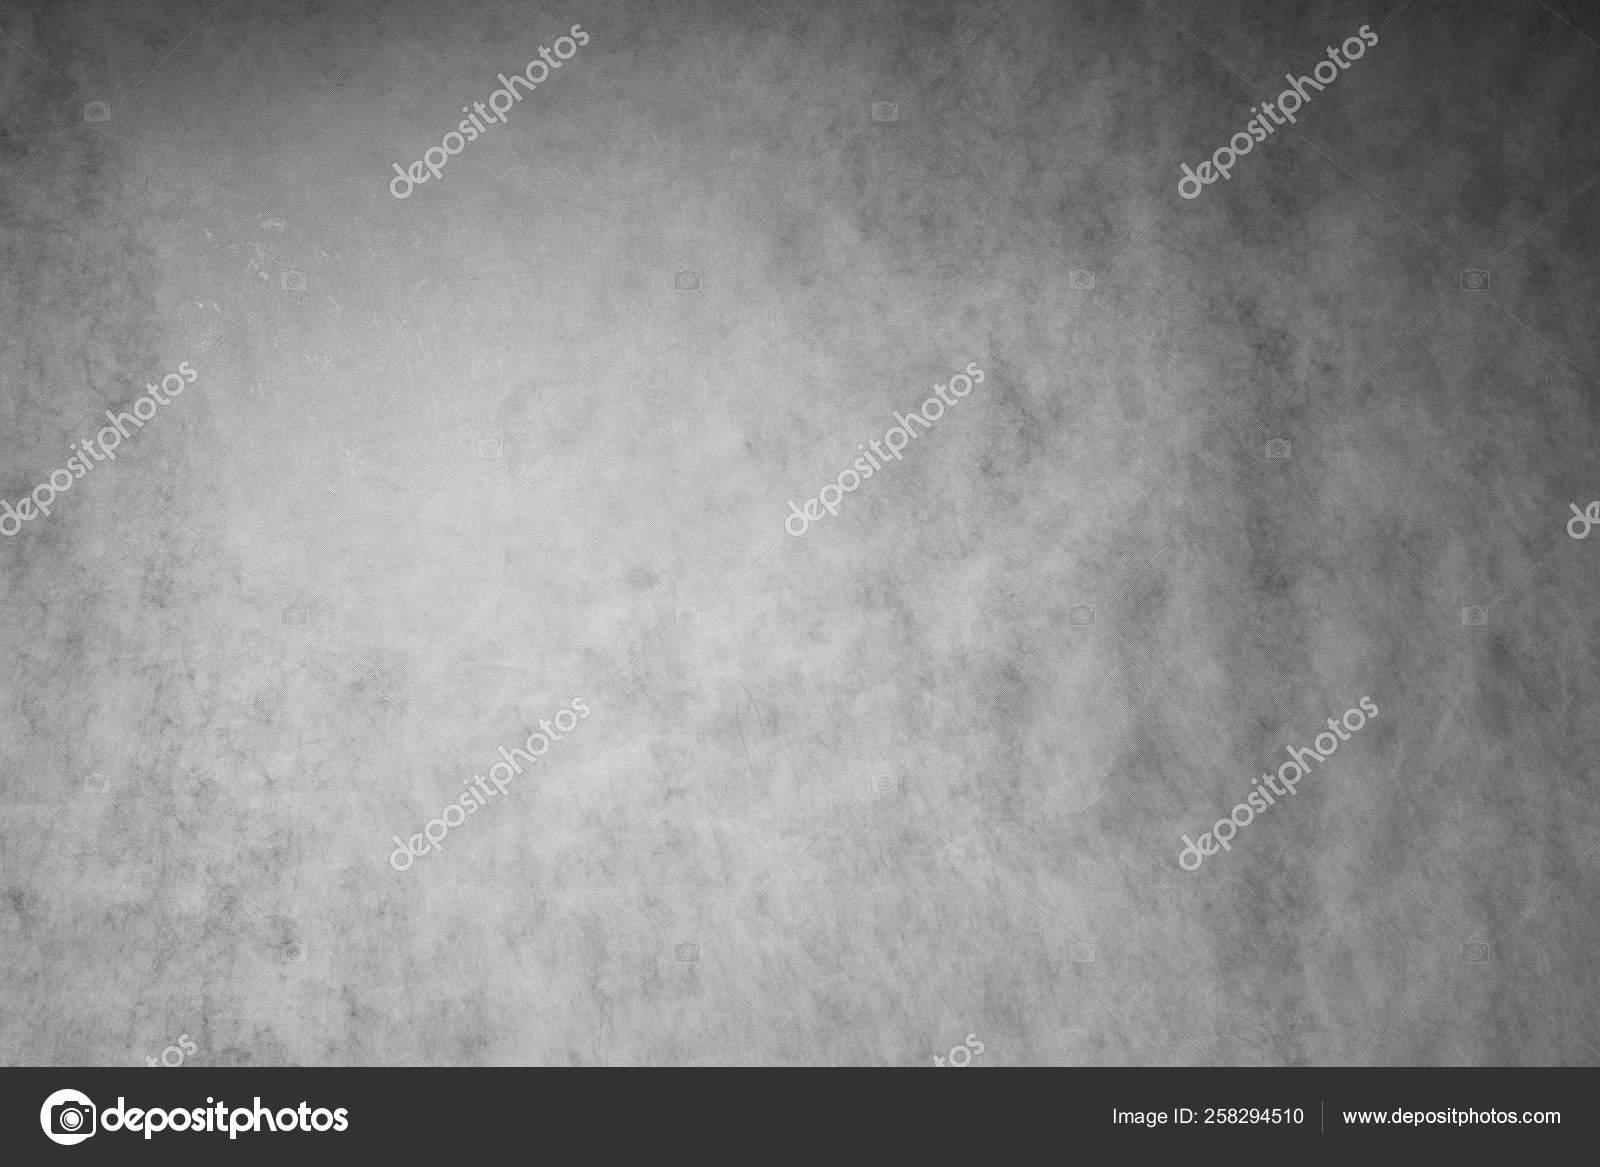 Grey Blue Black Abstract Background Blur Gradient Stock Photo C Nikolai Alekhin 258294510